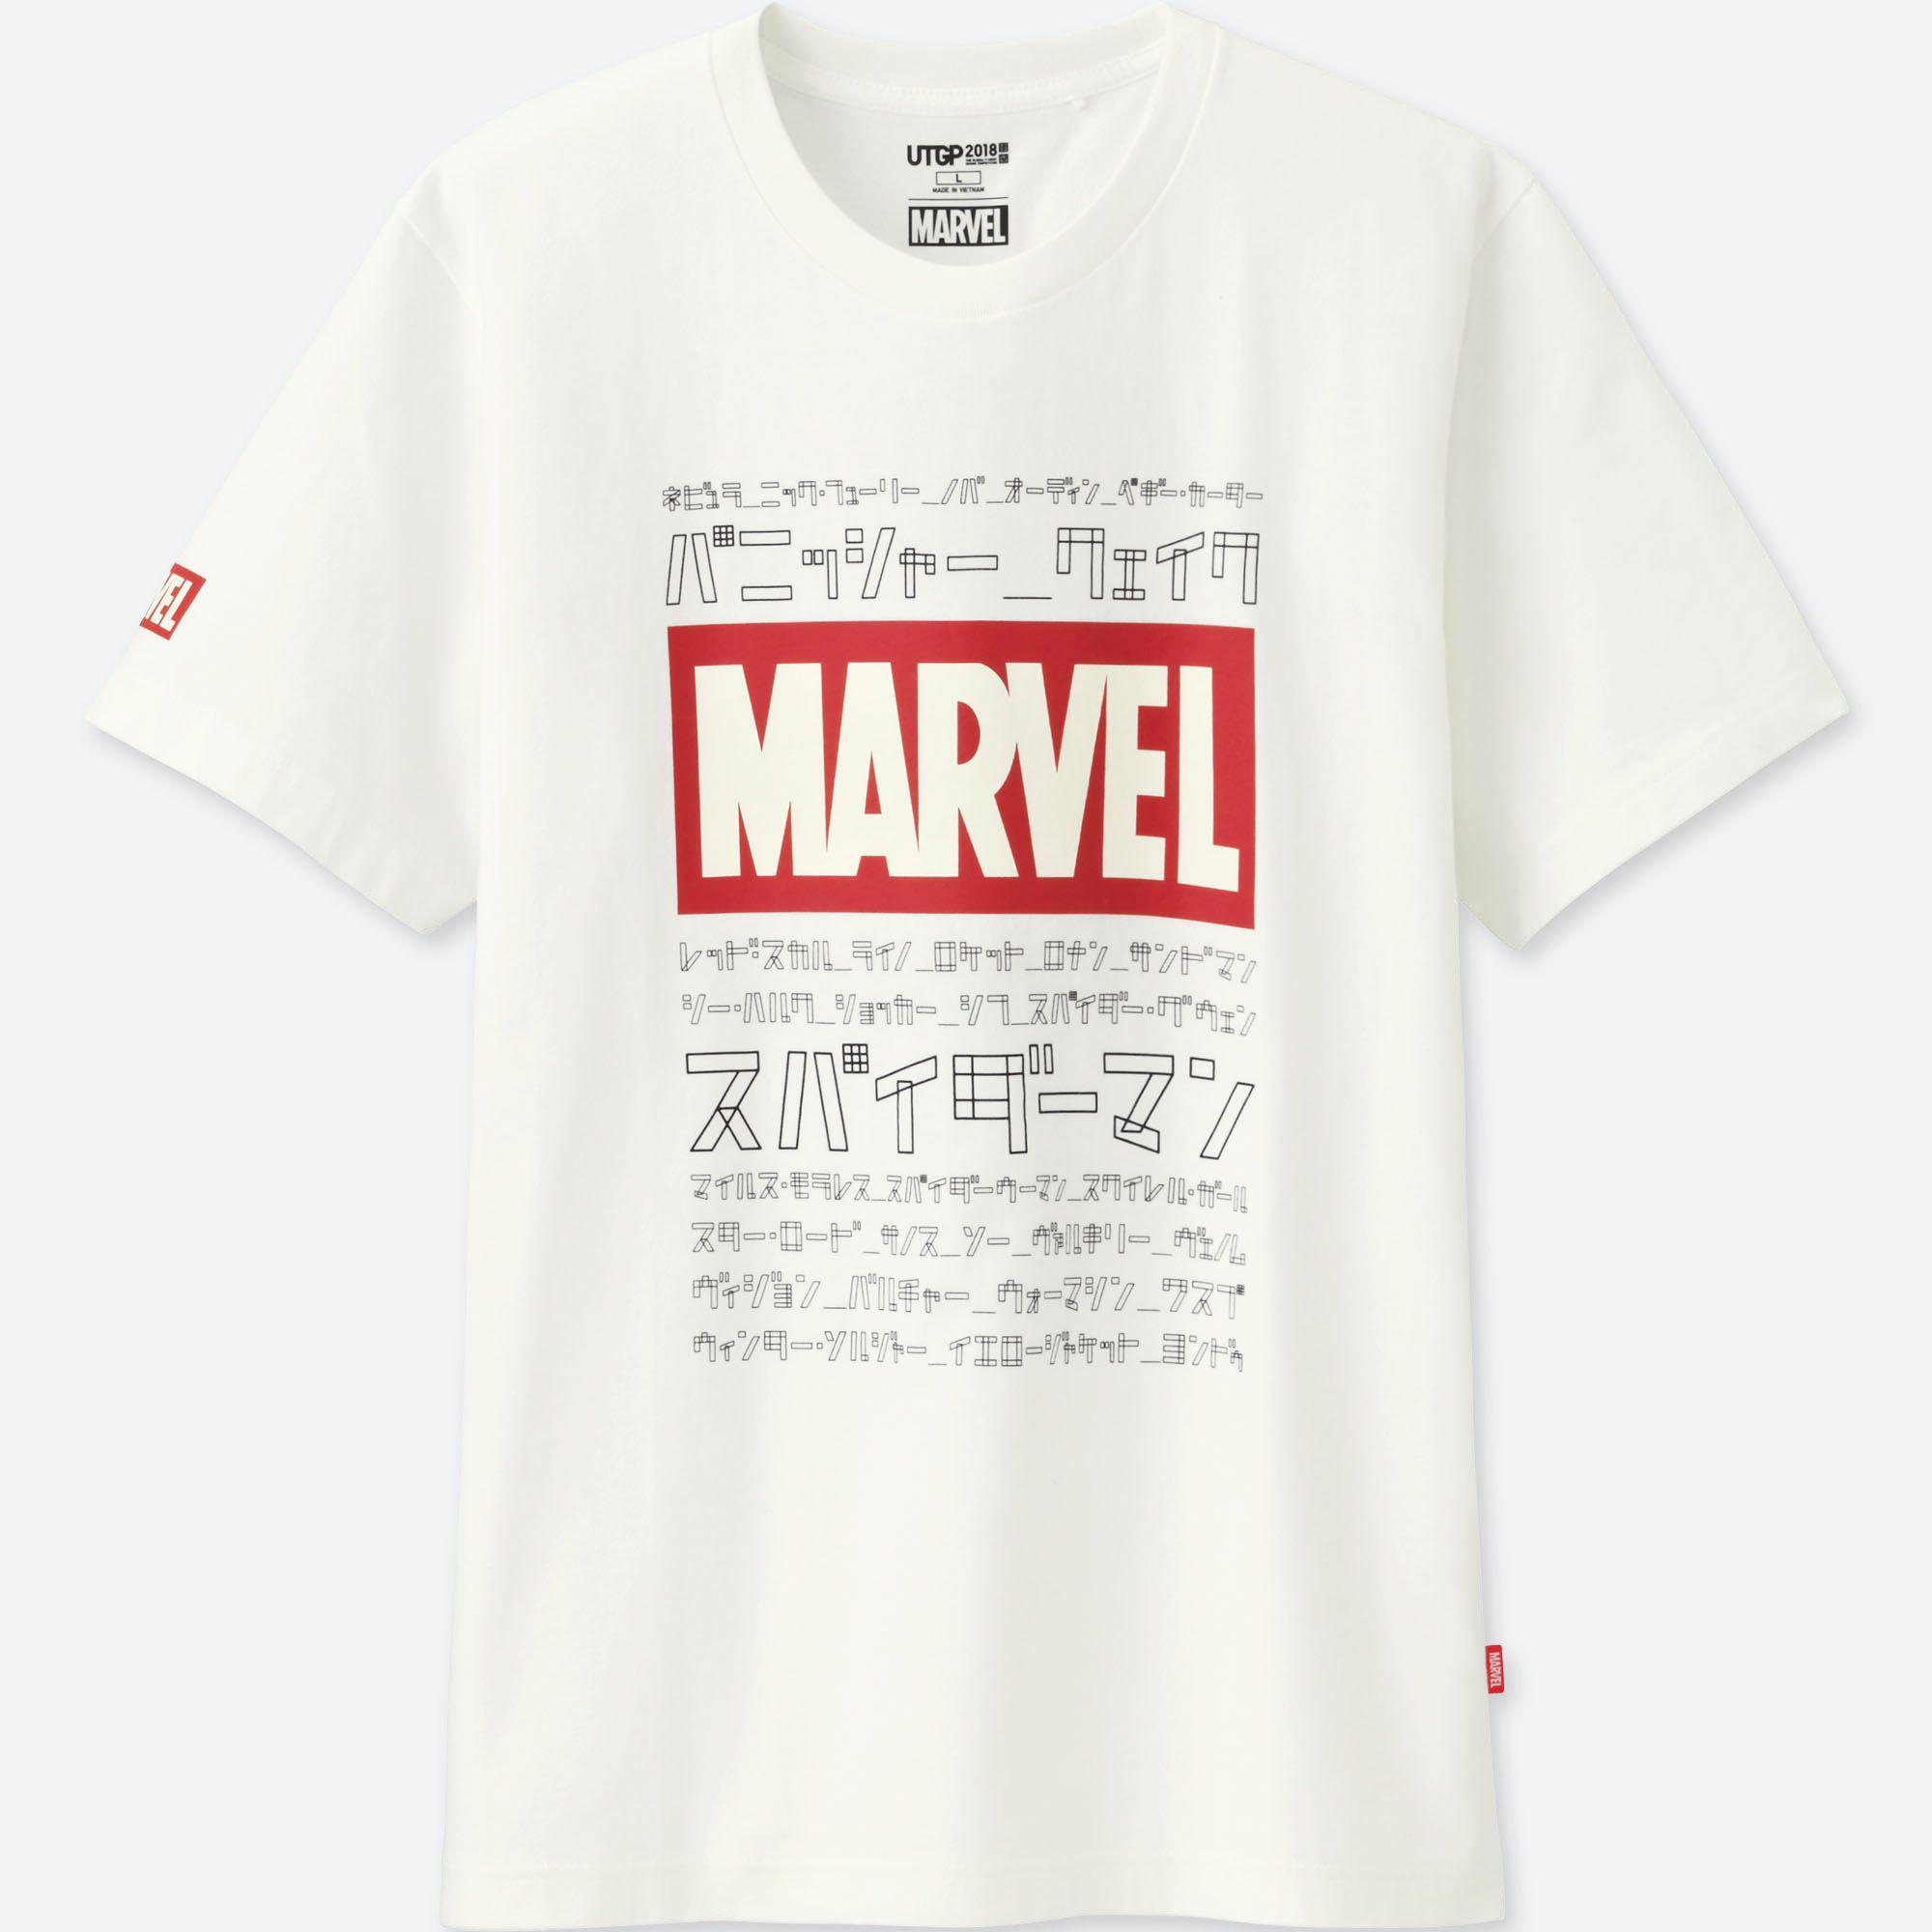 942bbc528 ... Uniqlo Ut: Uniqlo Ut Grand Prix Marvel Short Sleeve Graphic T